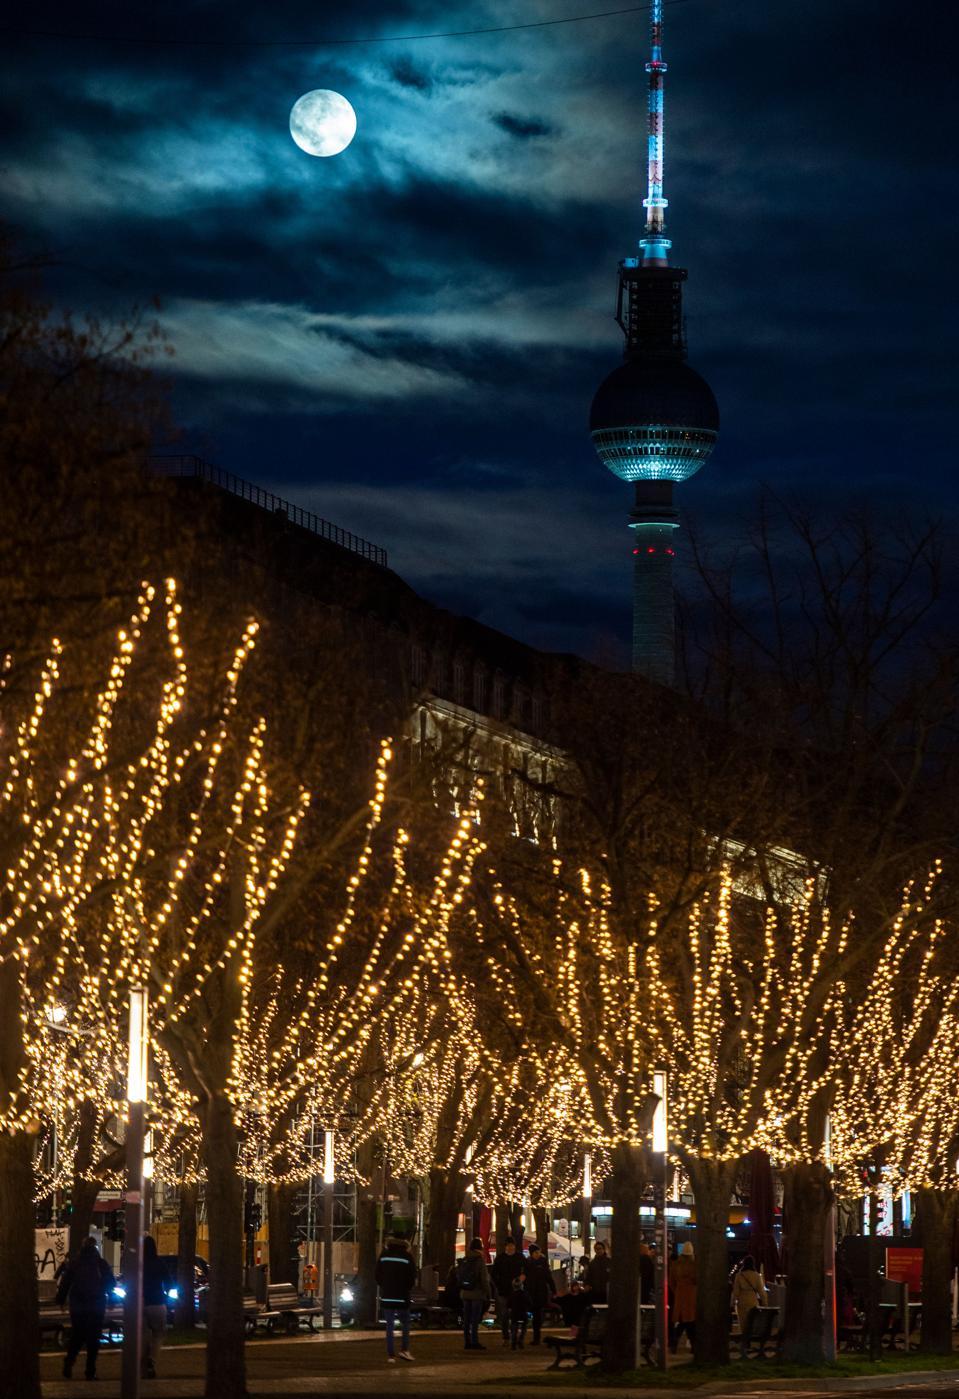 Full moon in GERMANY-CHRISTMAS